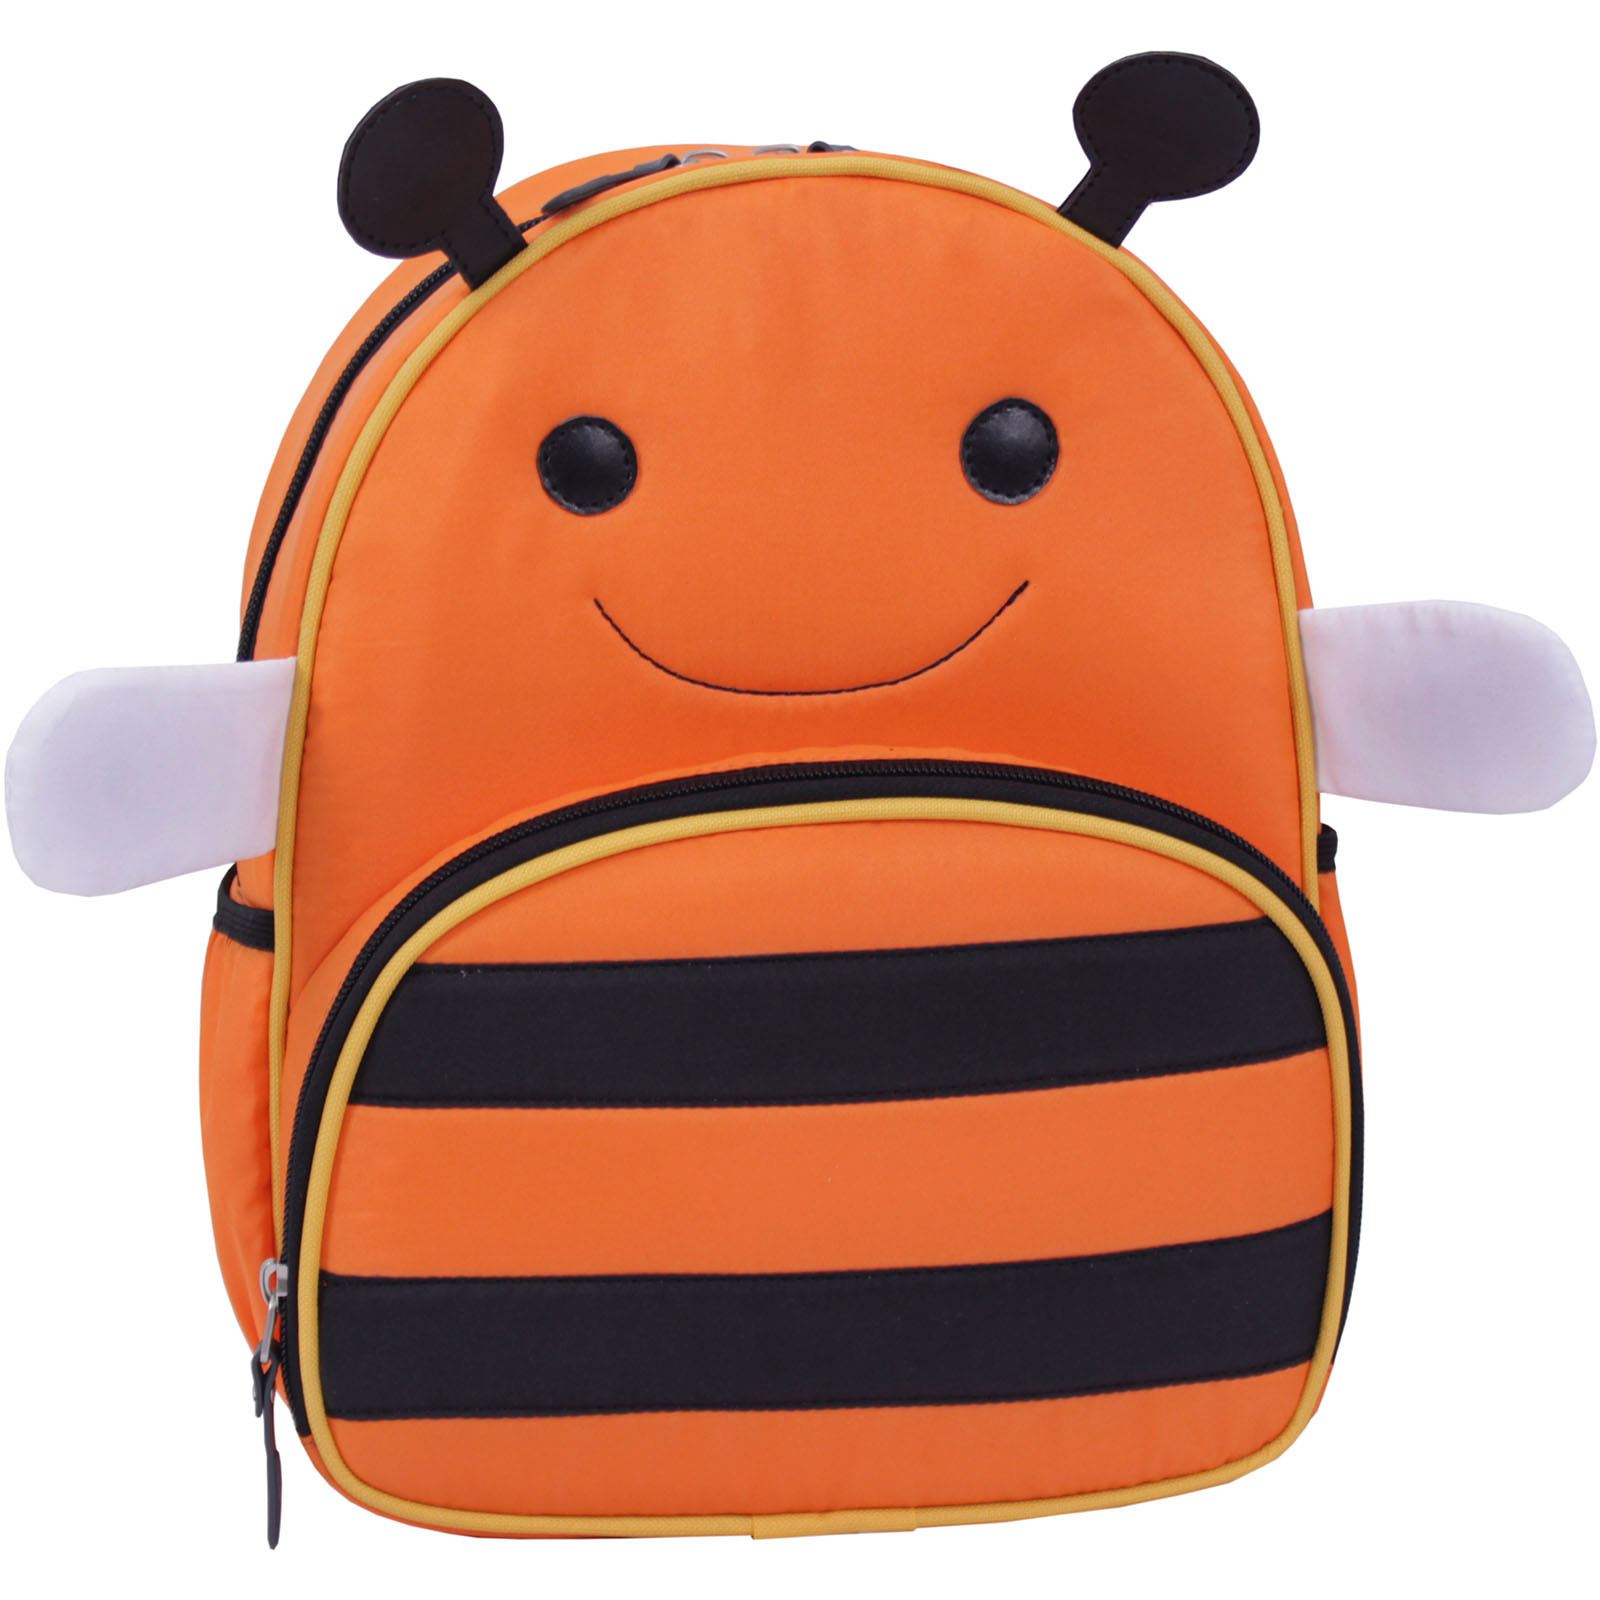 Каталог Рюкзак Bagland Bee 5 л. оранжевый (0051115) IMG_6712.JPG